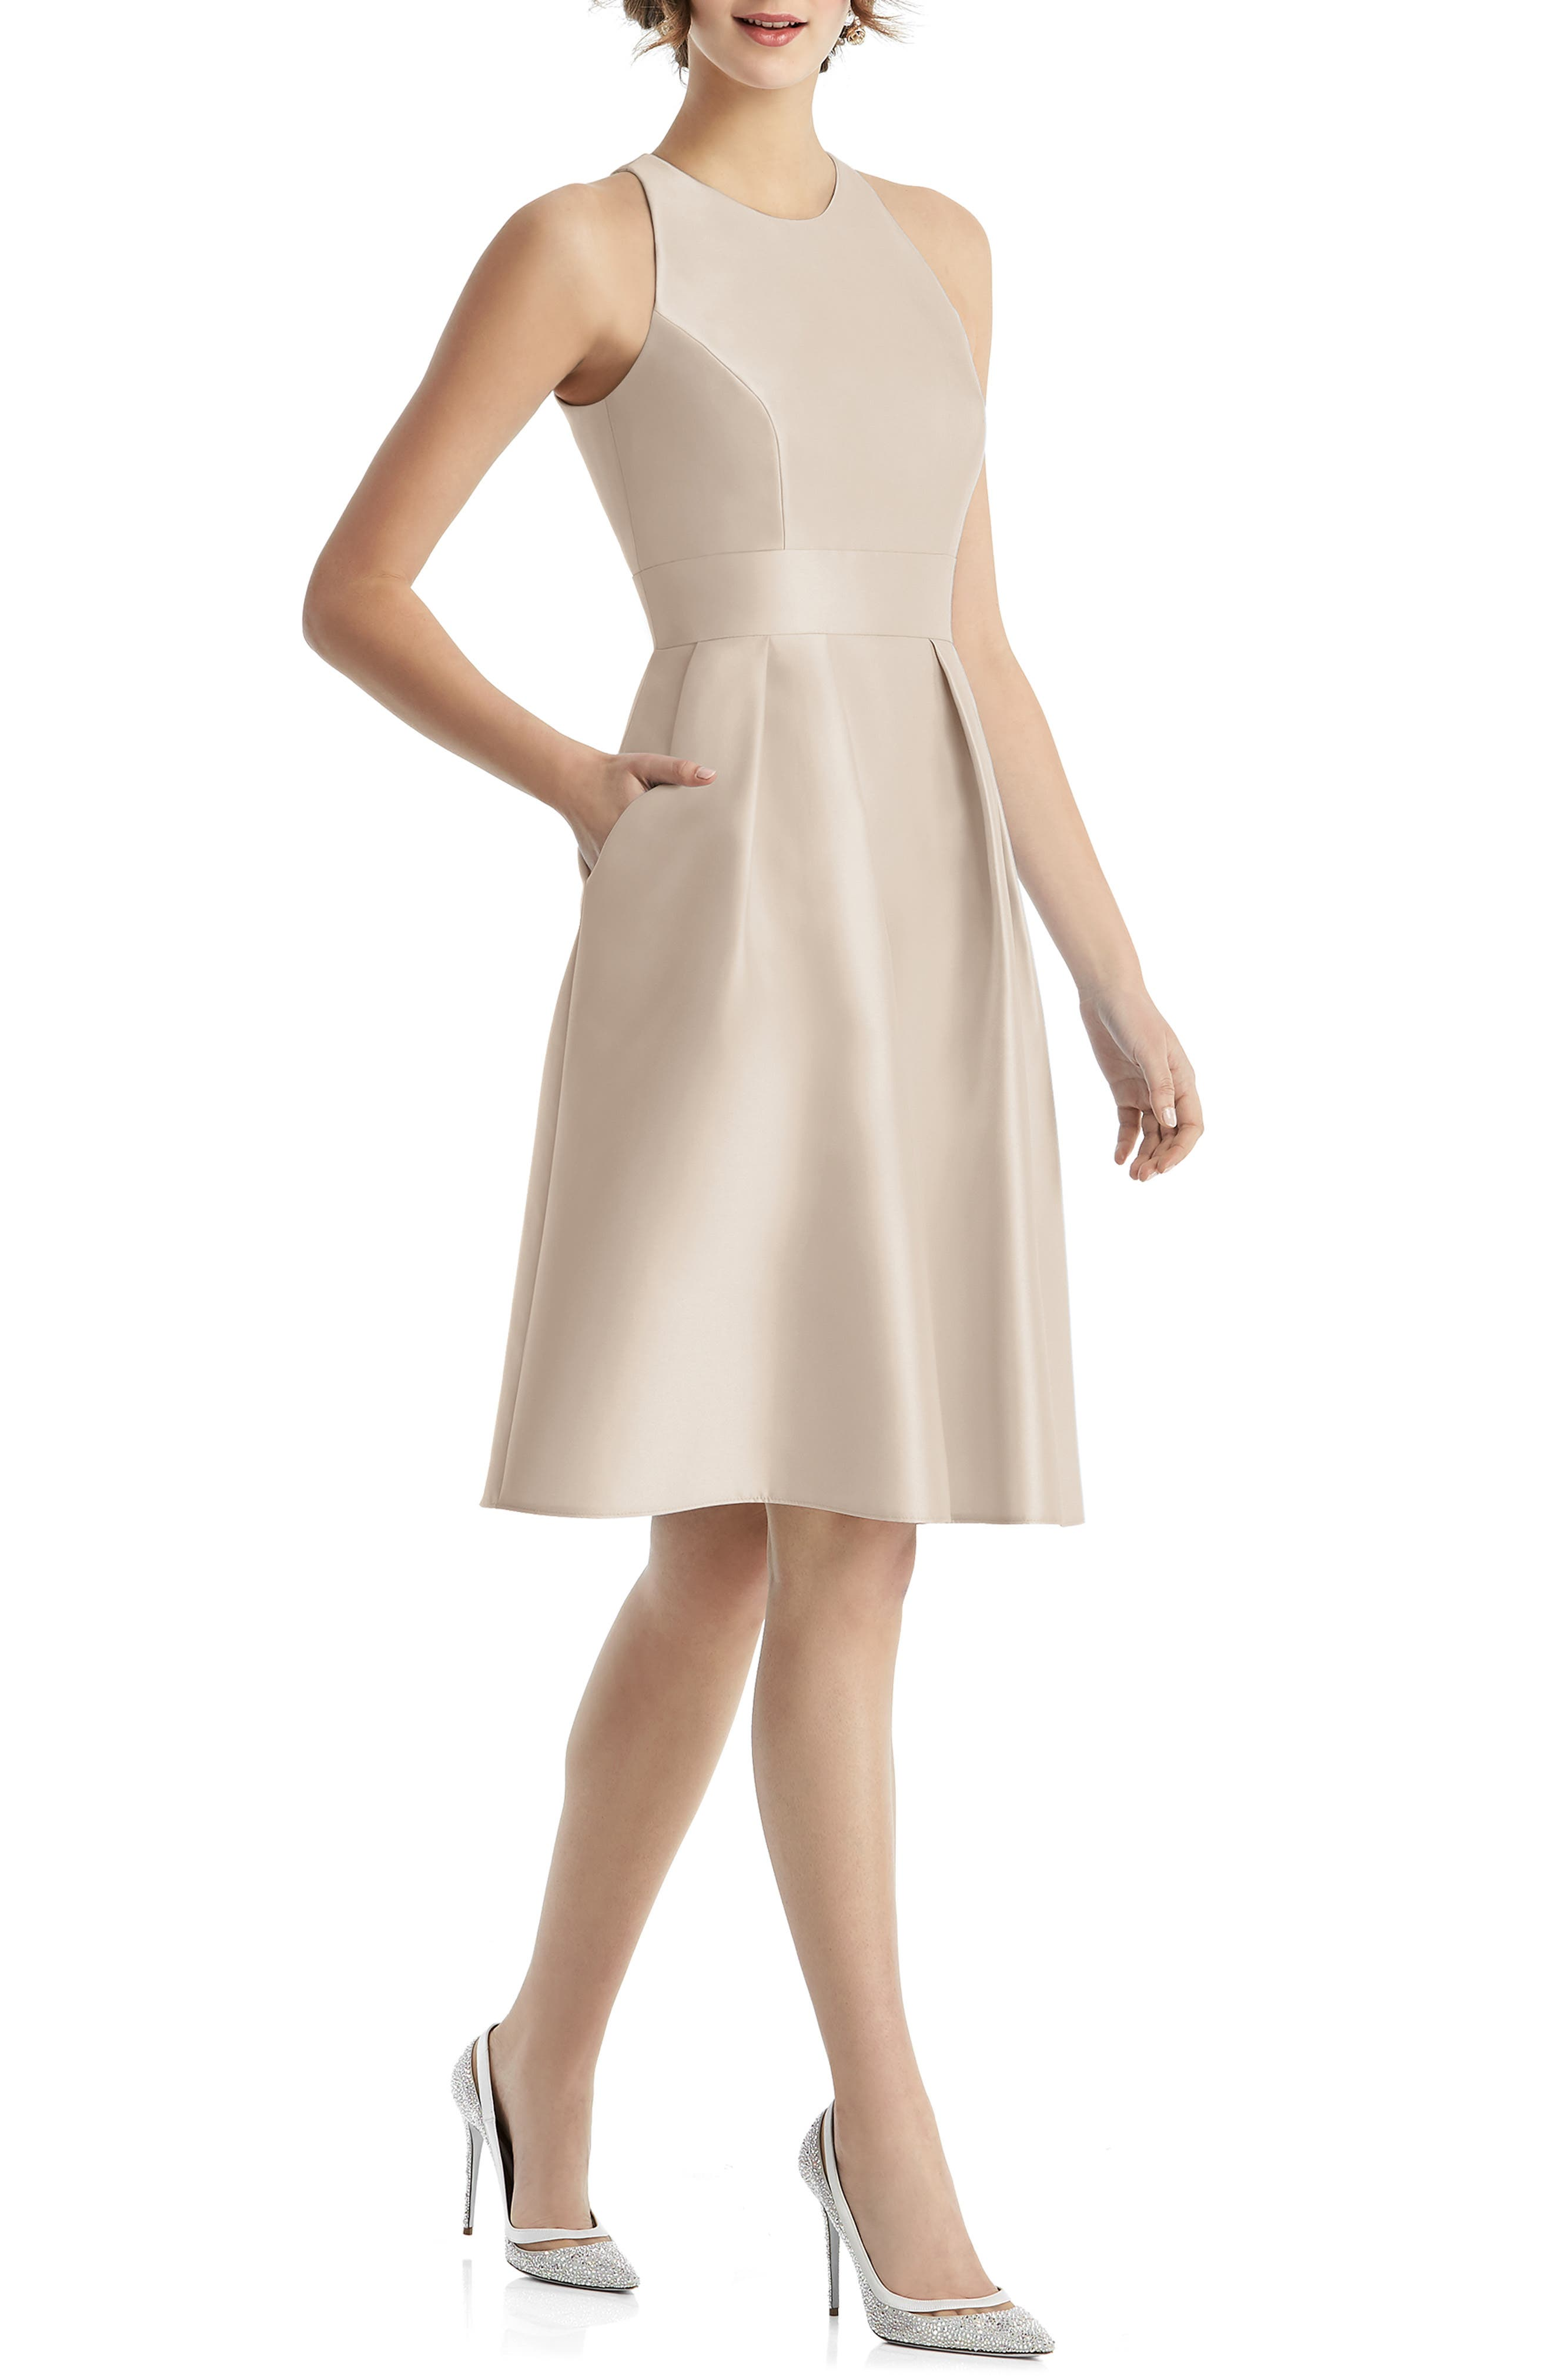 Jewel Neck Satin Cocktail Dress